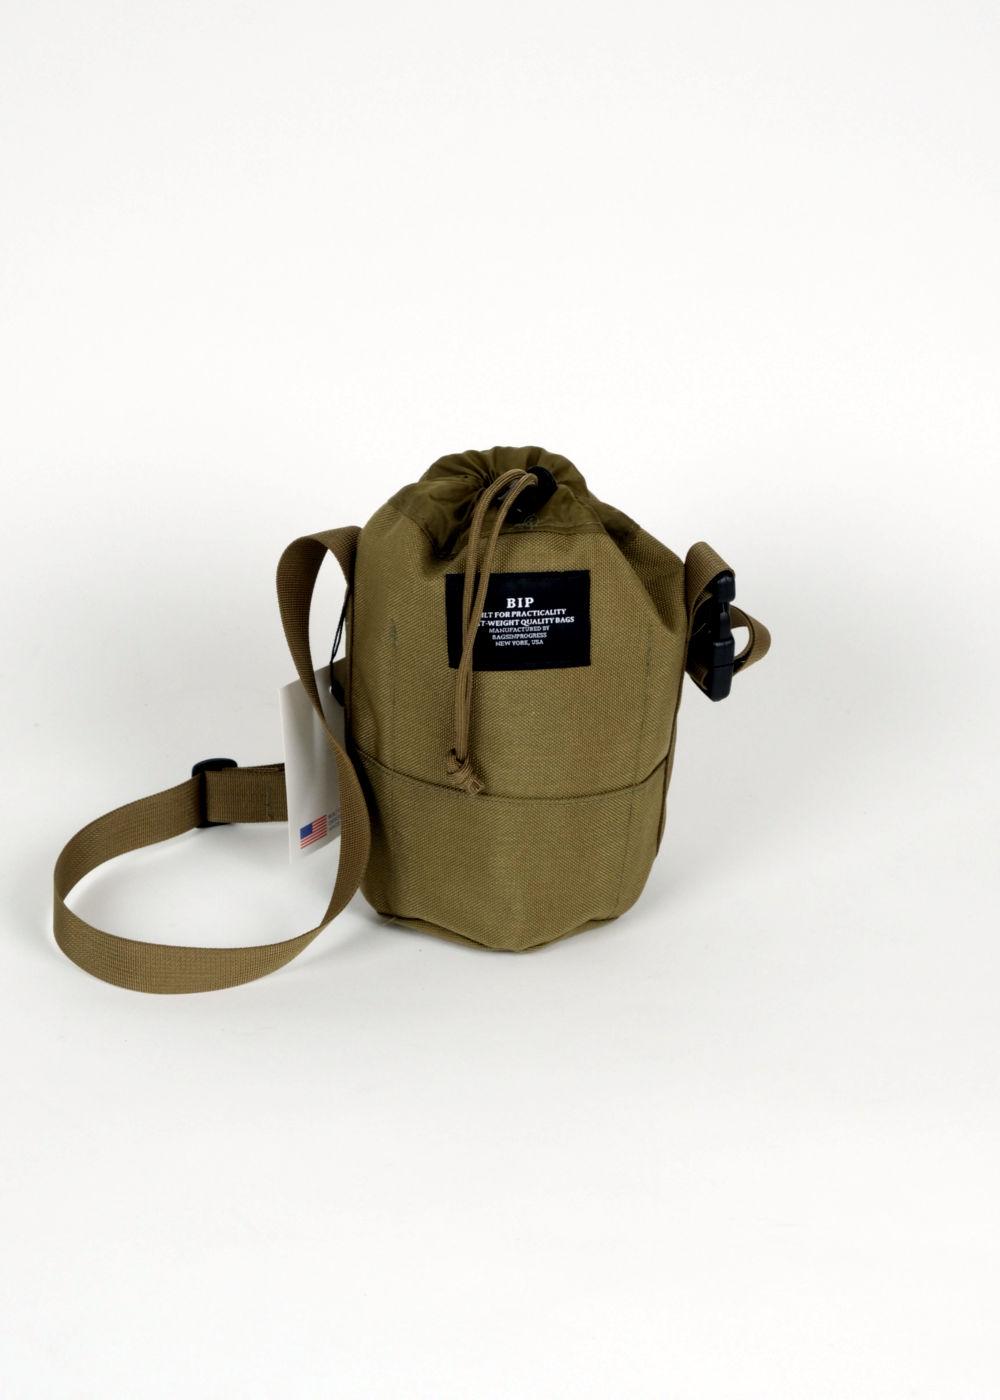 Bags-In-Progress-Bucket-Belt-Bag-Khaki_01